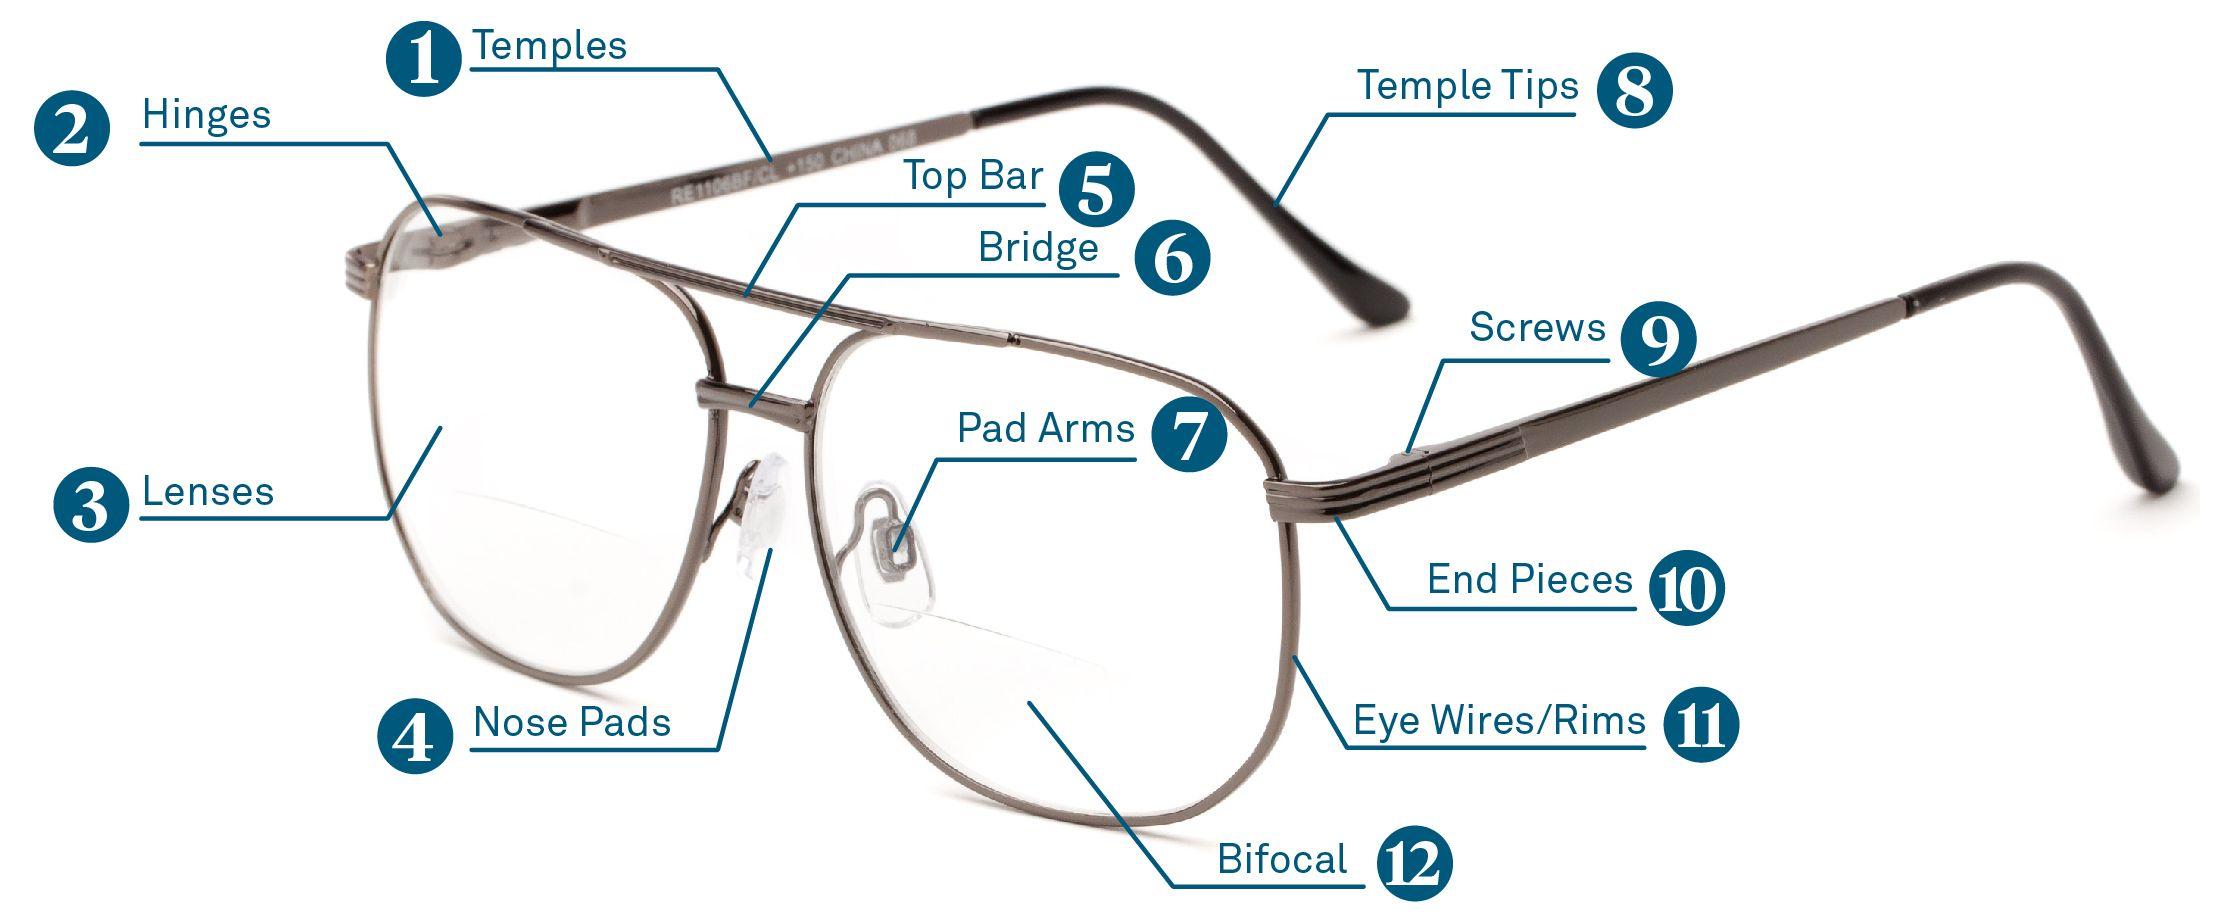 Parts Of An Eyeglass Frame Glasses Diagram Readers Com Eyeglasses Frames Eyeglasses Glasses